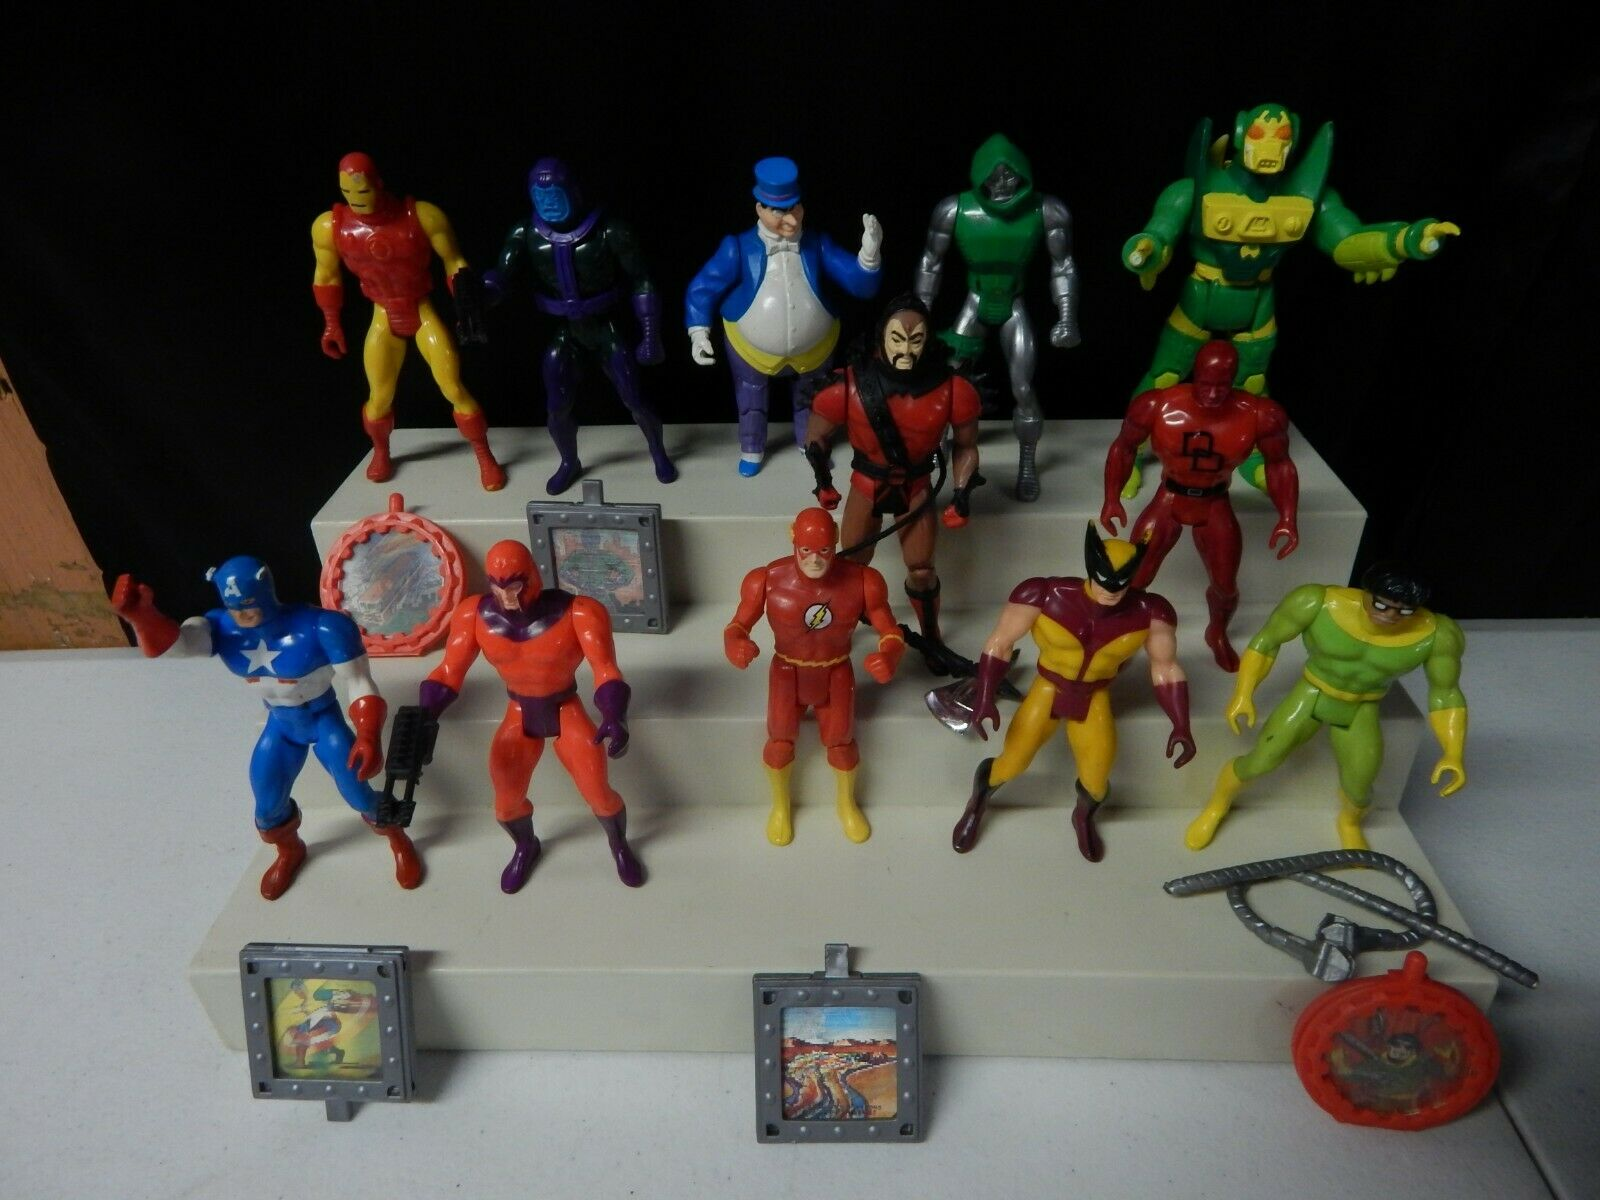 1984 1985 Vintage Marvel  DC KENNER SUPER HEROES Action Figure Collection lot 12  meilleur choix